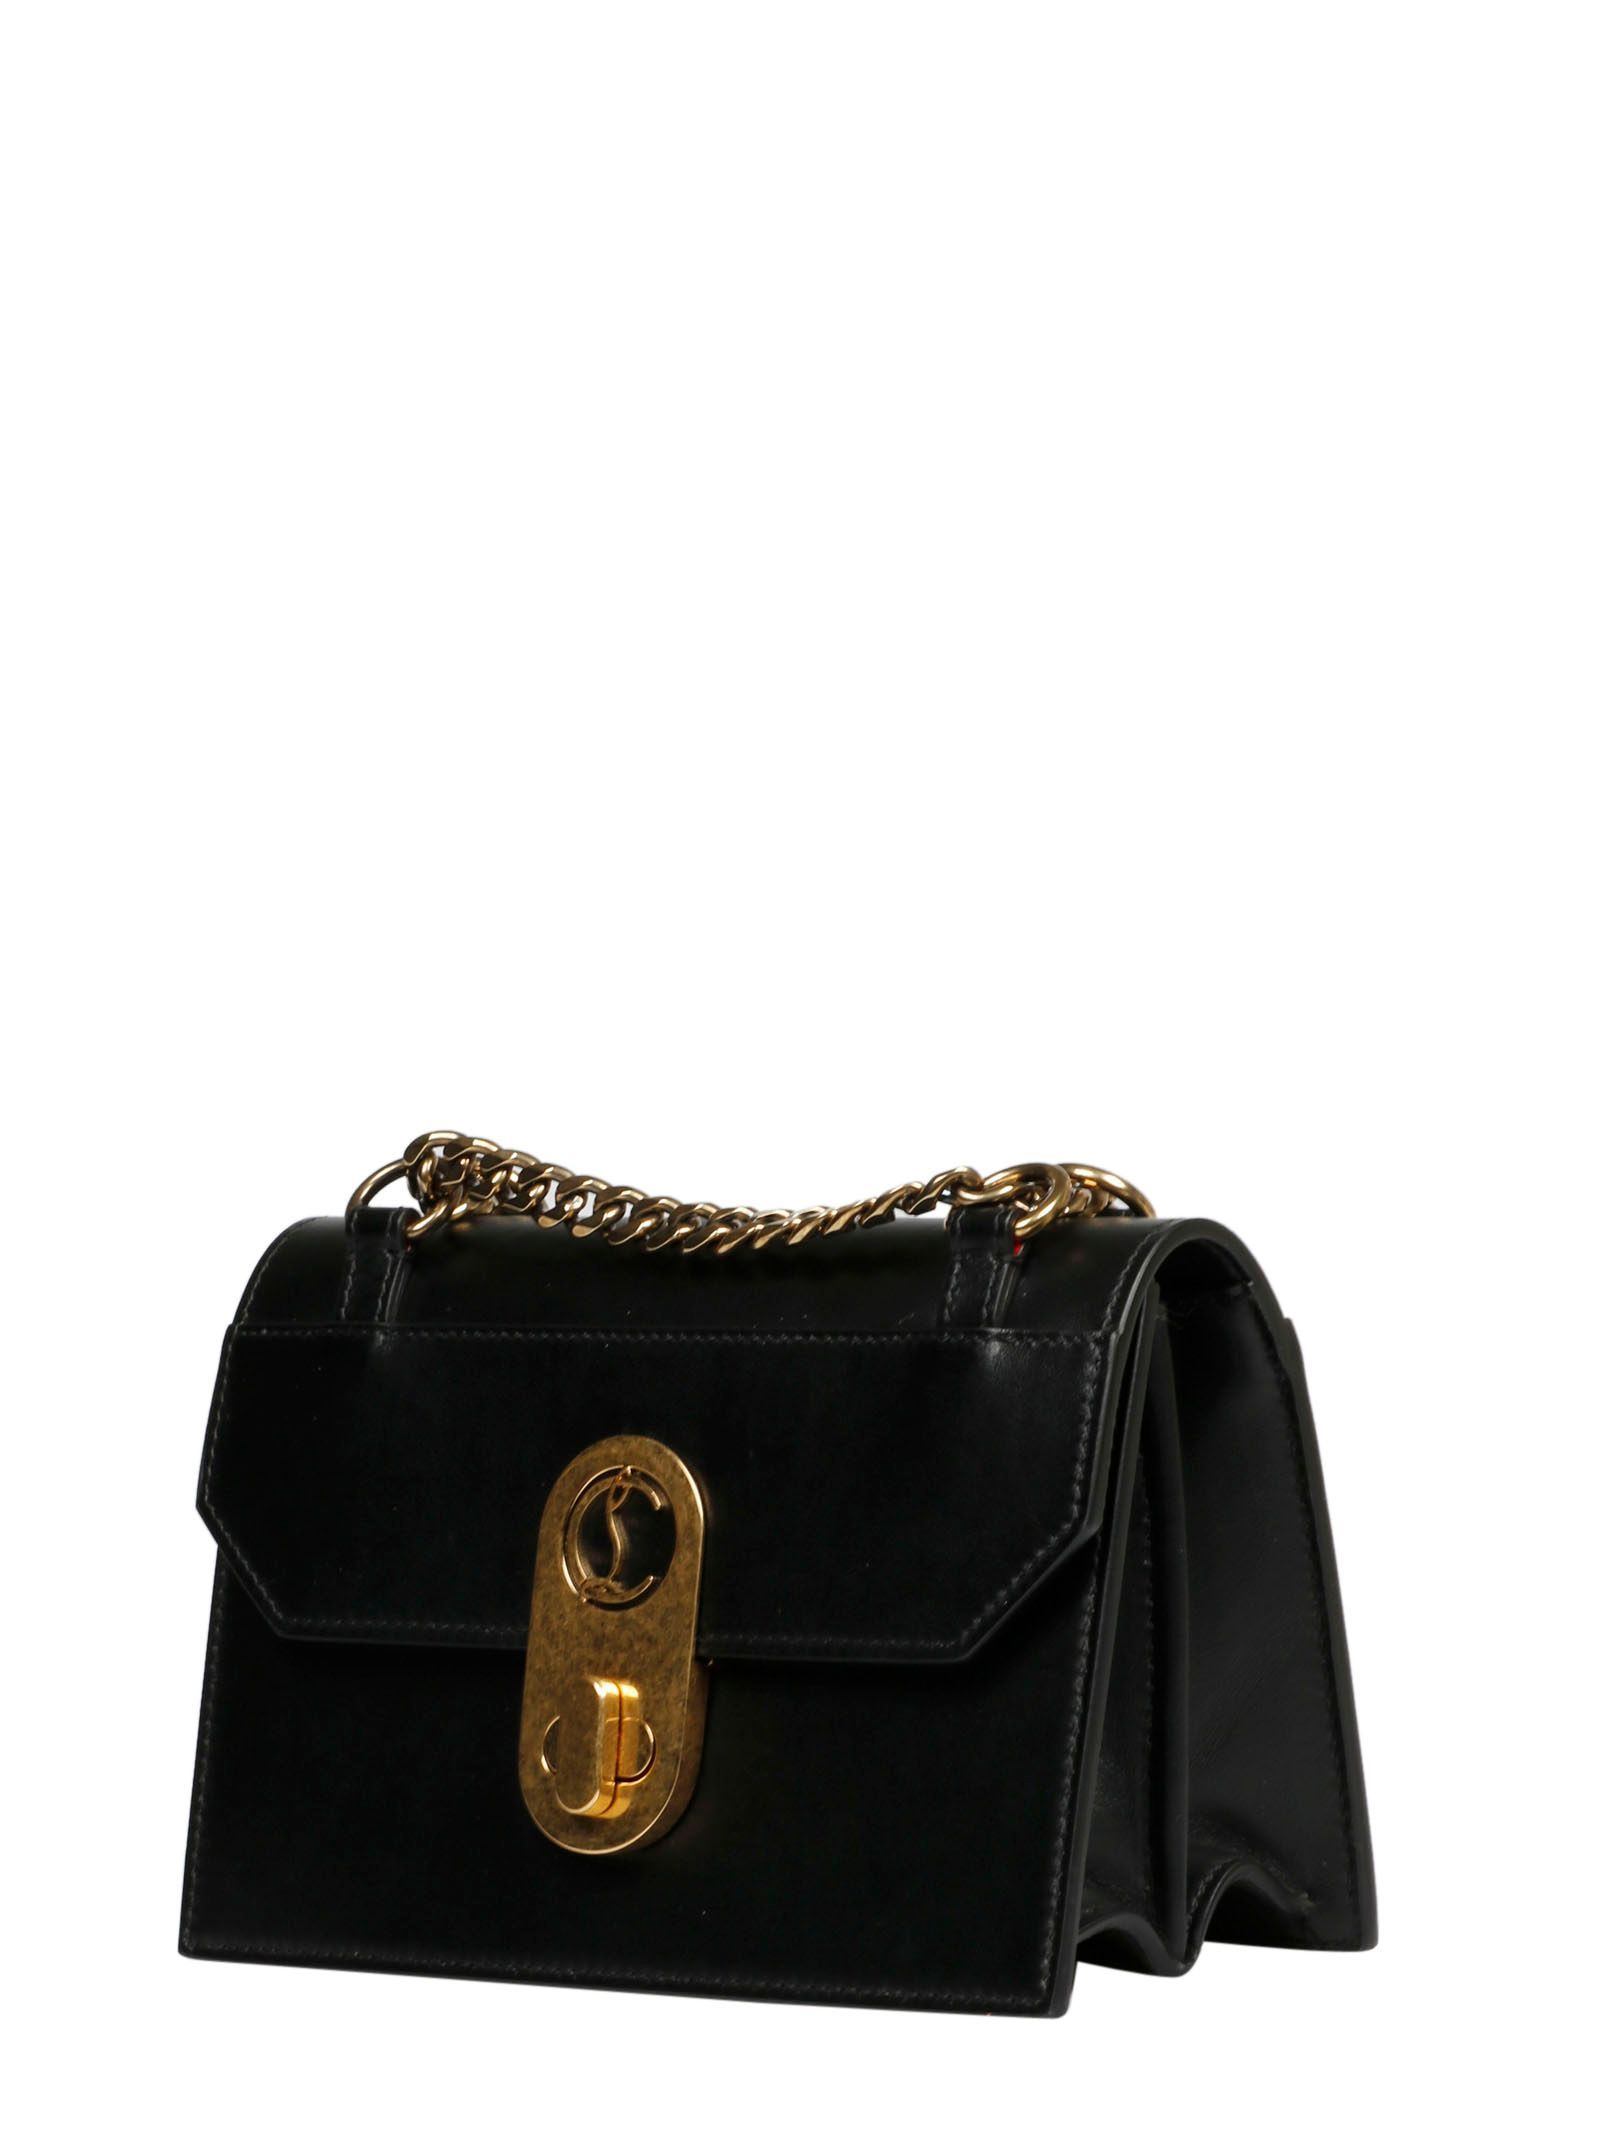 CHRISTIAN LOUBOUTIN WOMEN'S 1205064BK01 BLACK LEATHER SHOULDER BAG